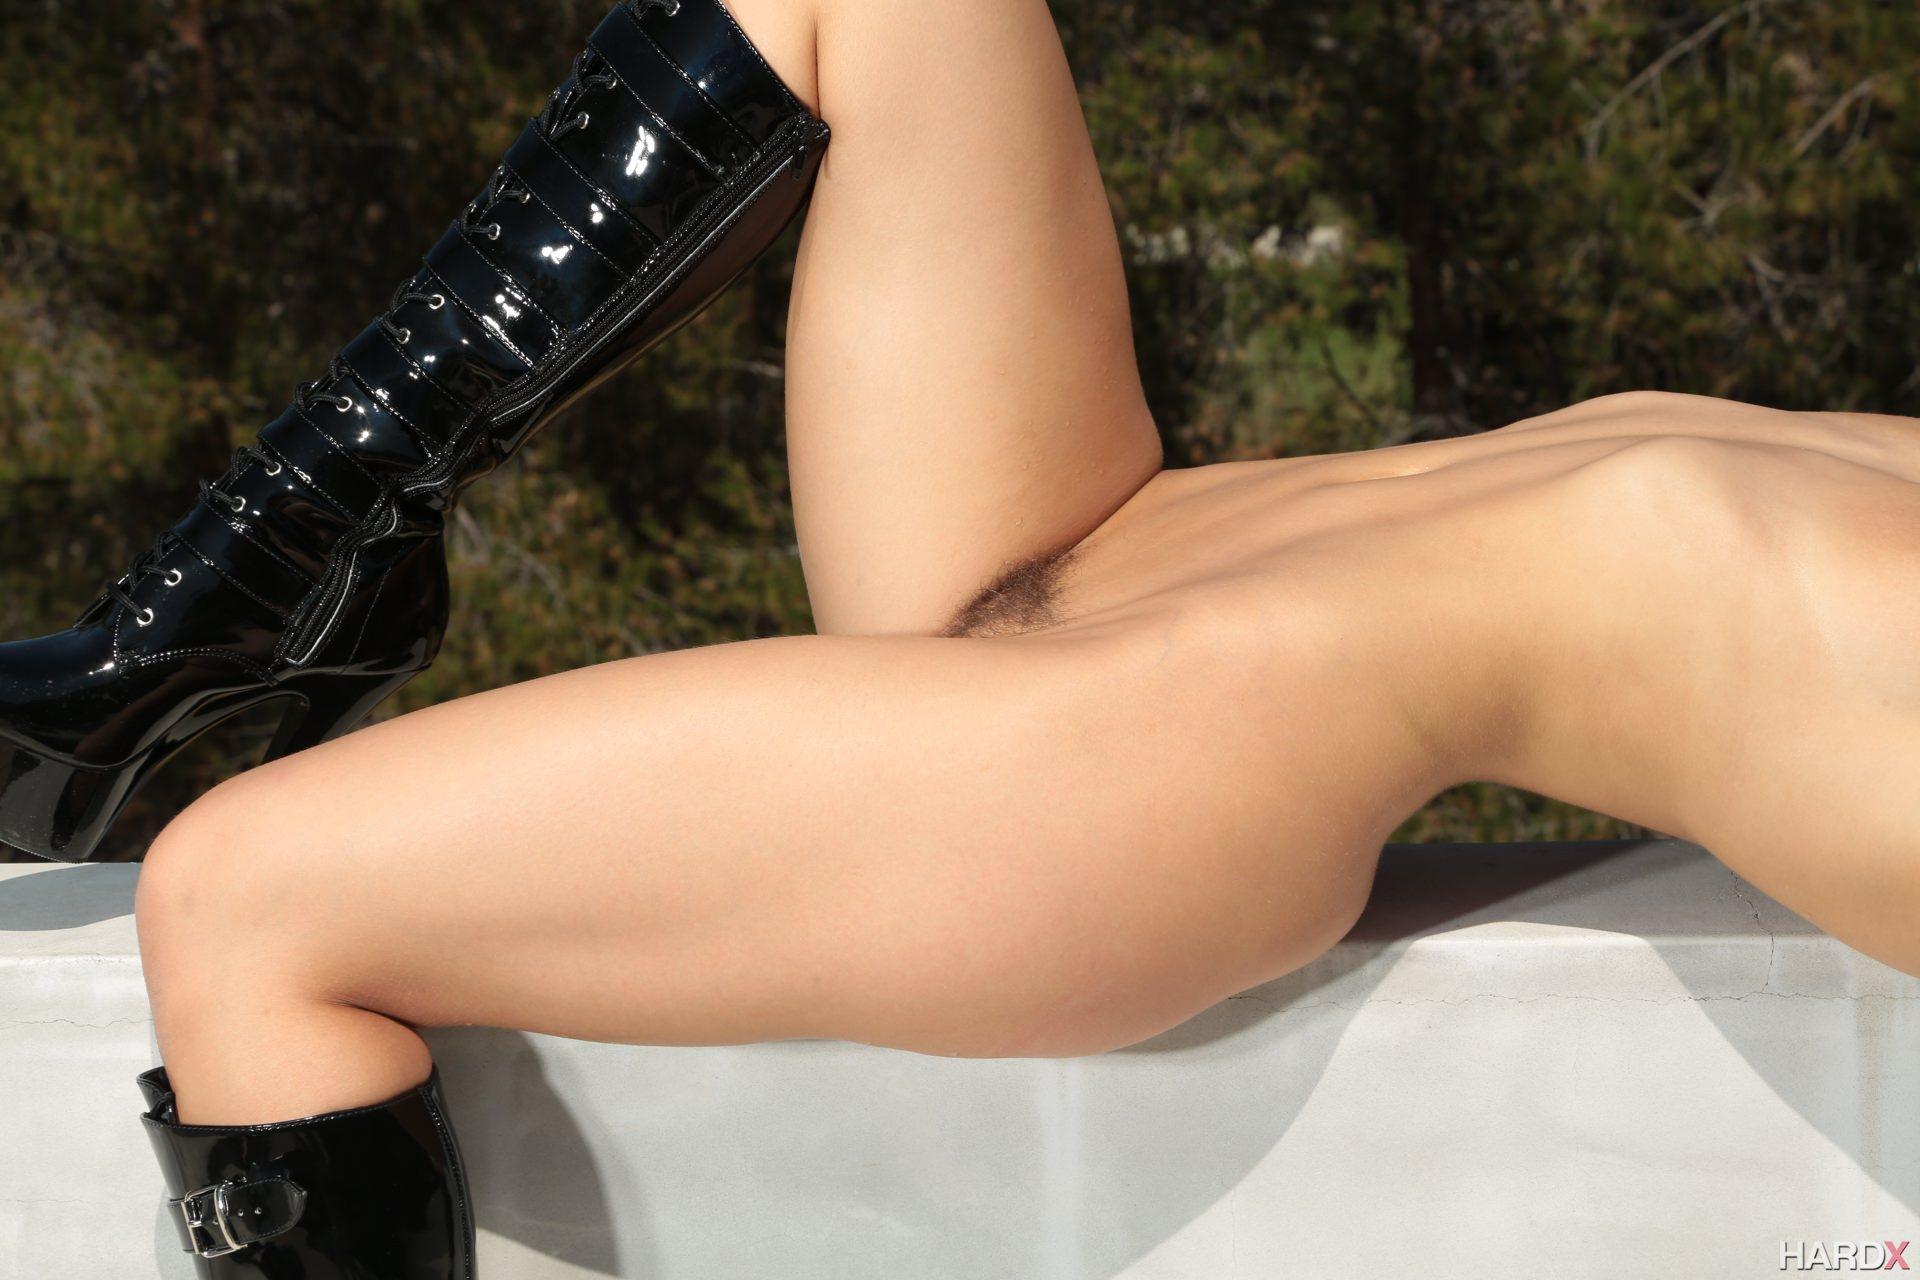 Evil Angel 'Lana Rhoades Unleashed Part 2' starring Adriana Chechik (Photo 144)